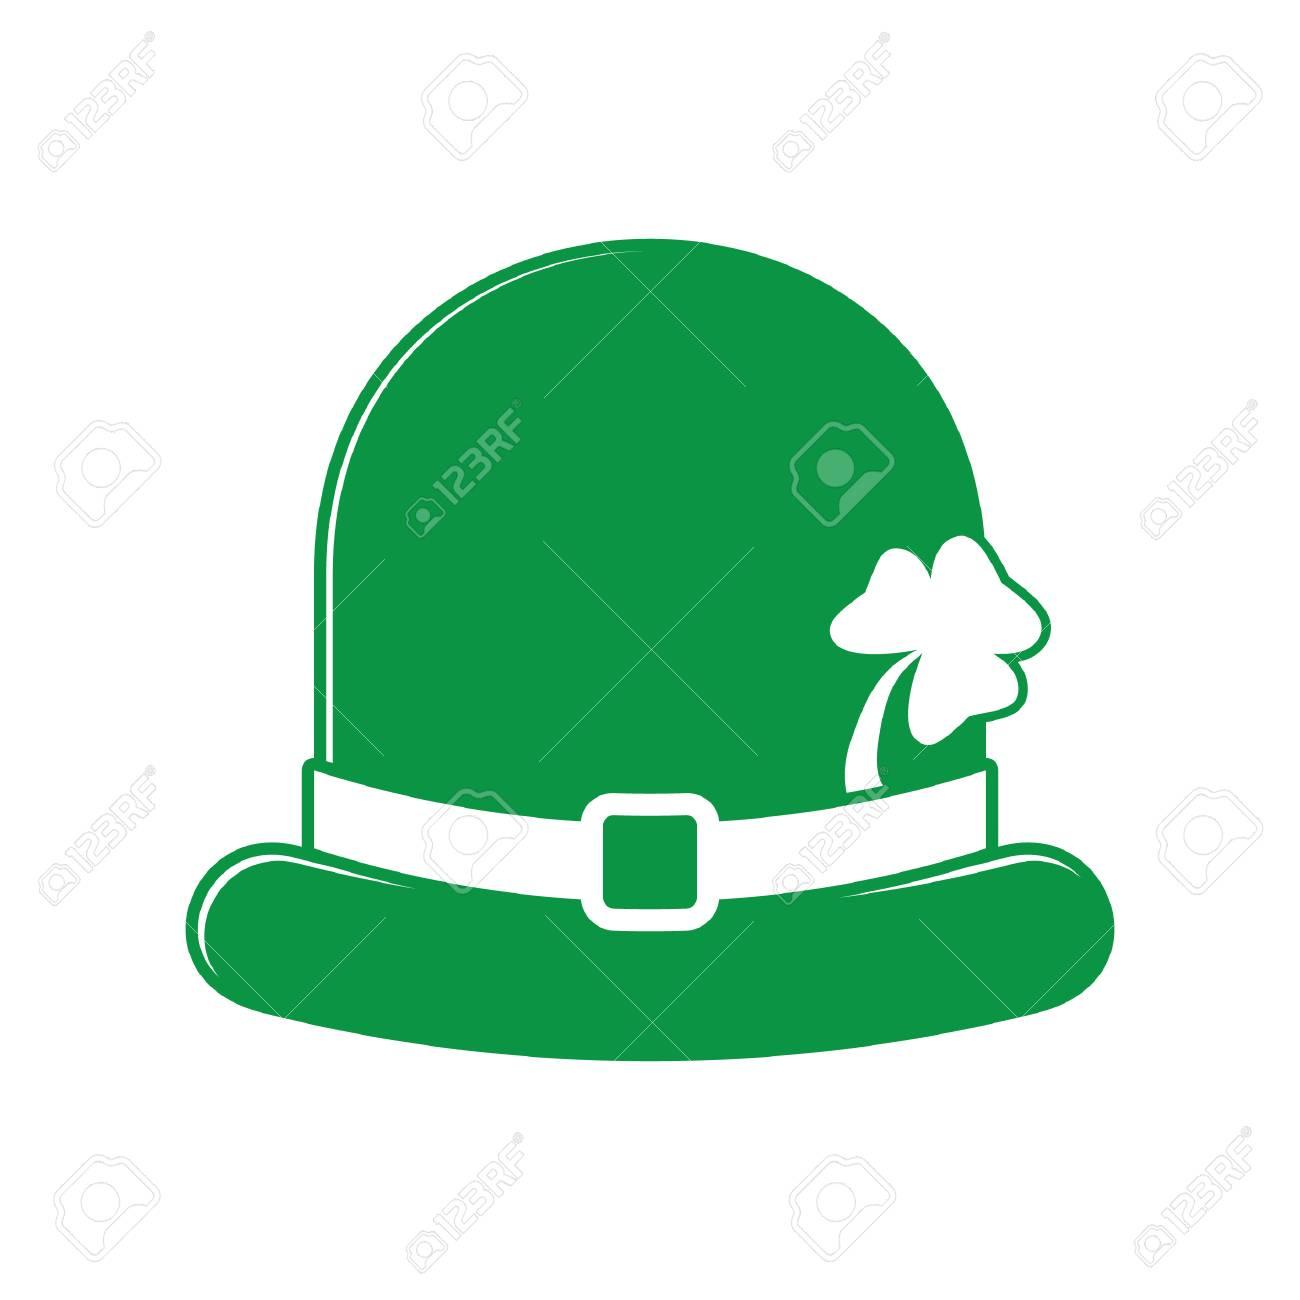 95110b4175f9b A bowler hat illustration. Stock Vector - 81420370